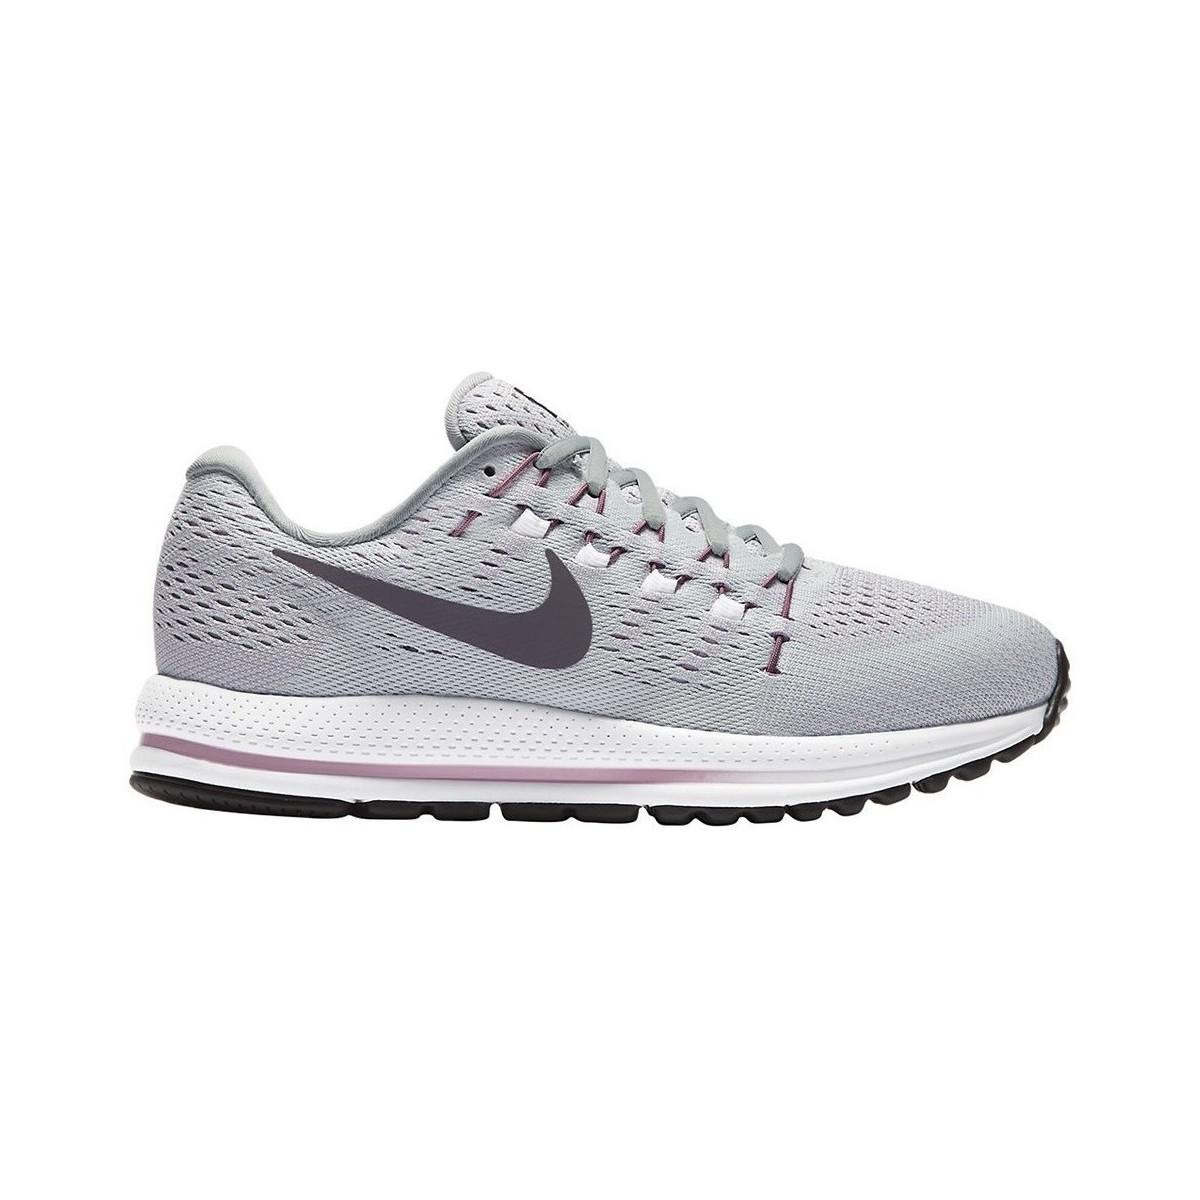 Lyst Nike Wmns Air Zoom Vomero 12 Zapatos Mujer De Mujer Zapatos Instructores En Gris 6e4111